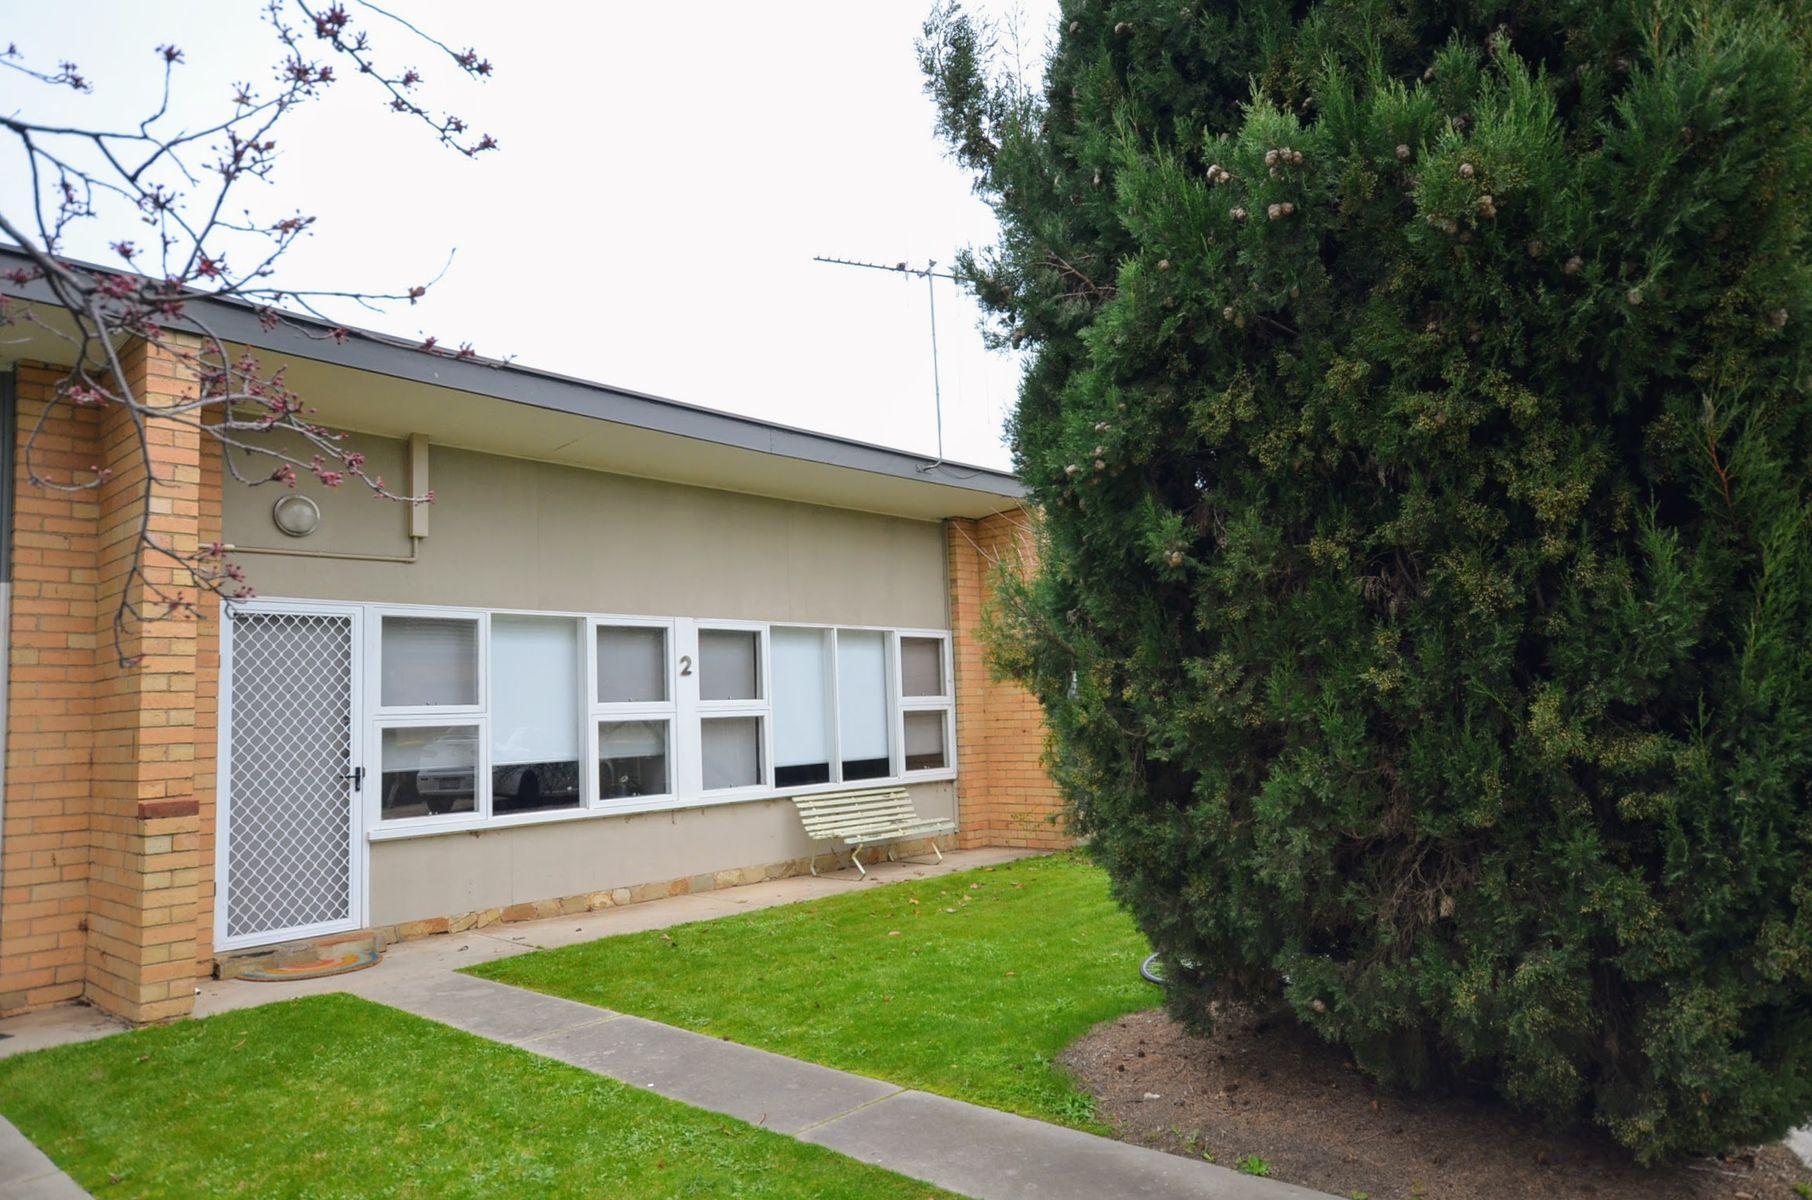 2/113 Bridge Street, Bendigo, VIC 3550